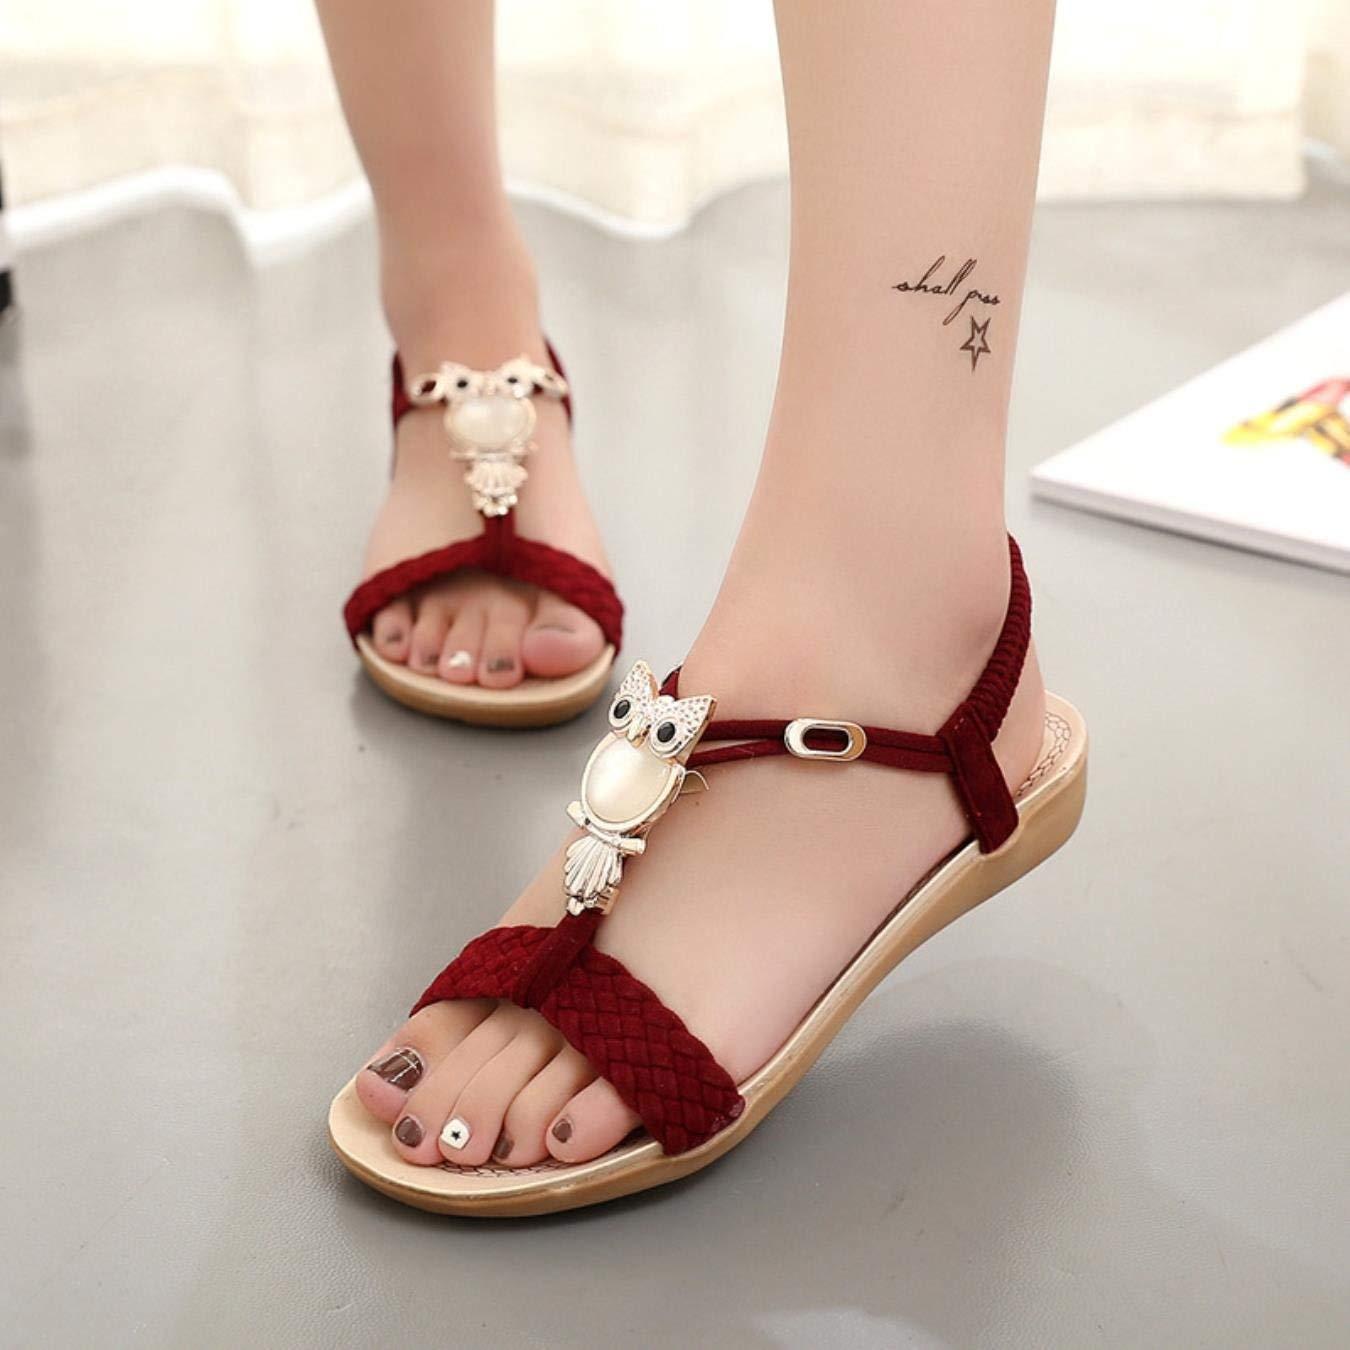 a439be781577 Get Quotations · Women Sandals Women shoes Flip Flops women39 s sandals  Summer Ankle-Strap Sandals